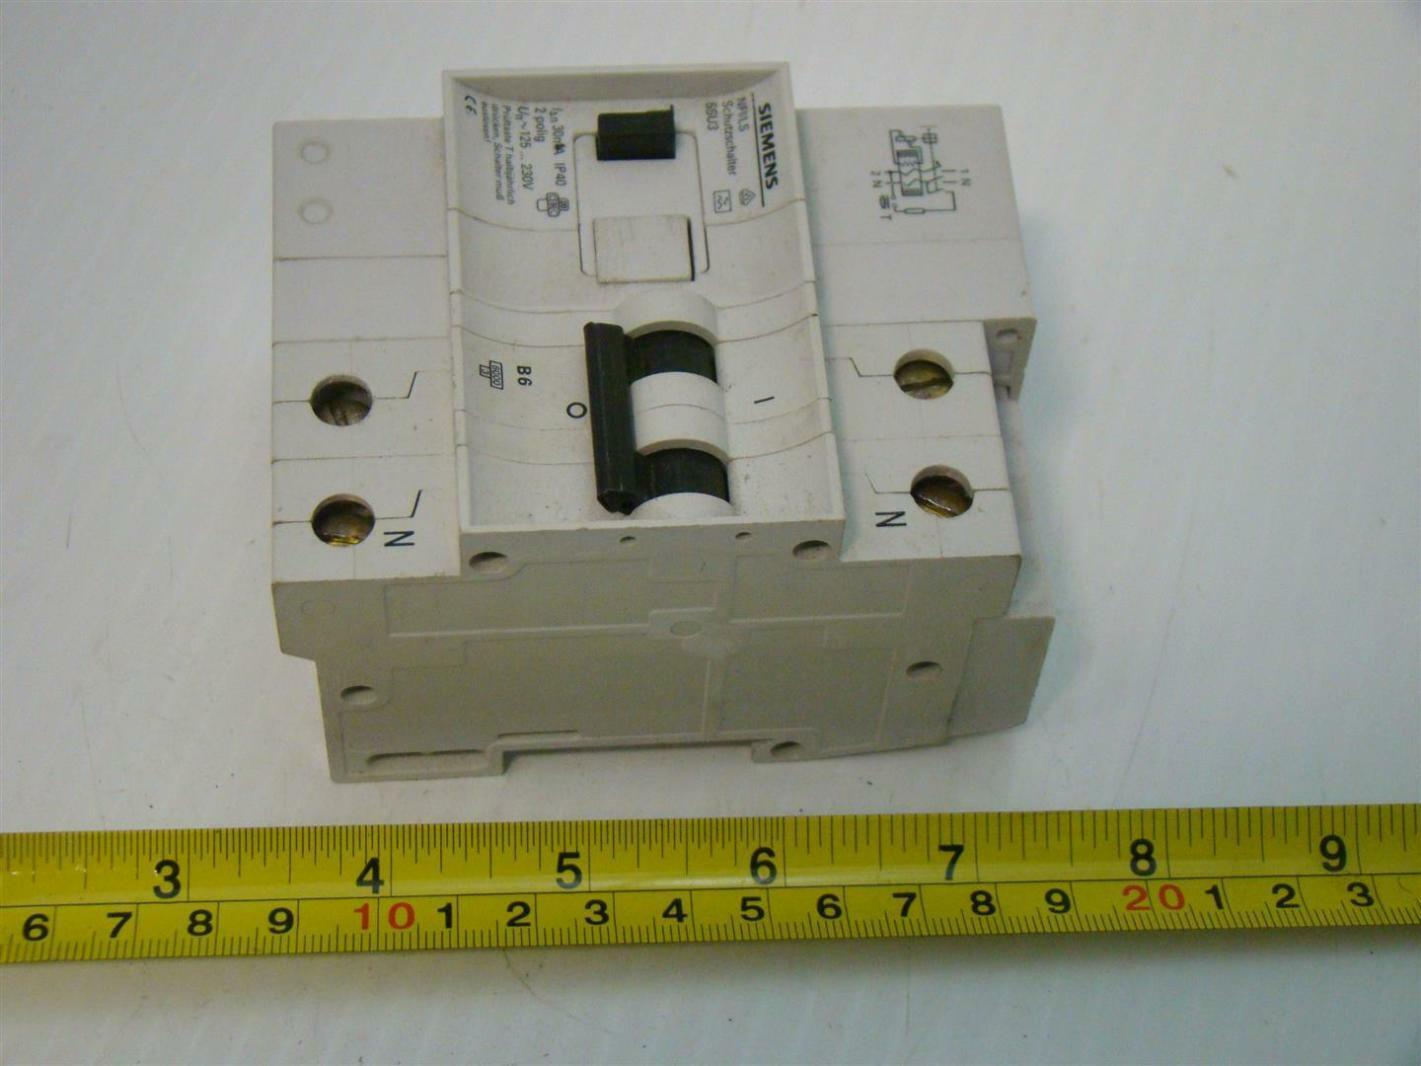 Siemens Miniature Circuit Breaker 6a Din Mount 125 230v 5su3 Breakers Images Photos